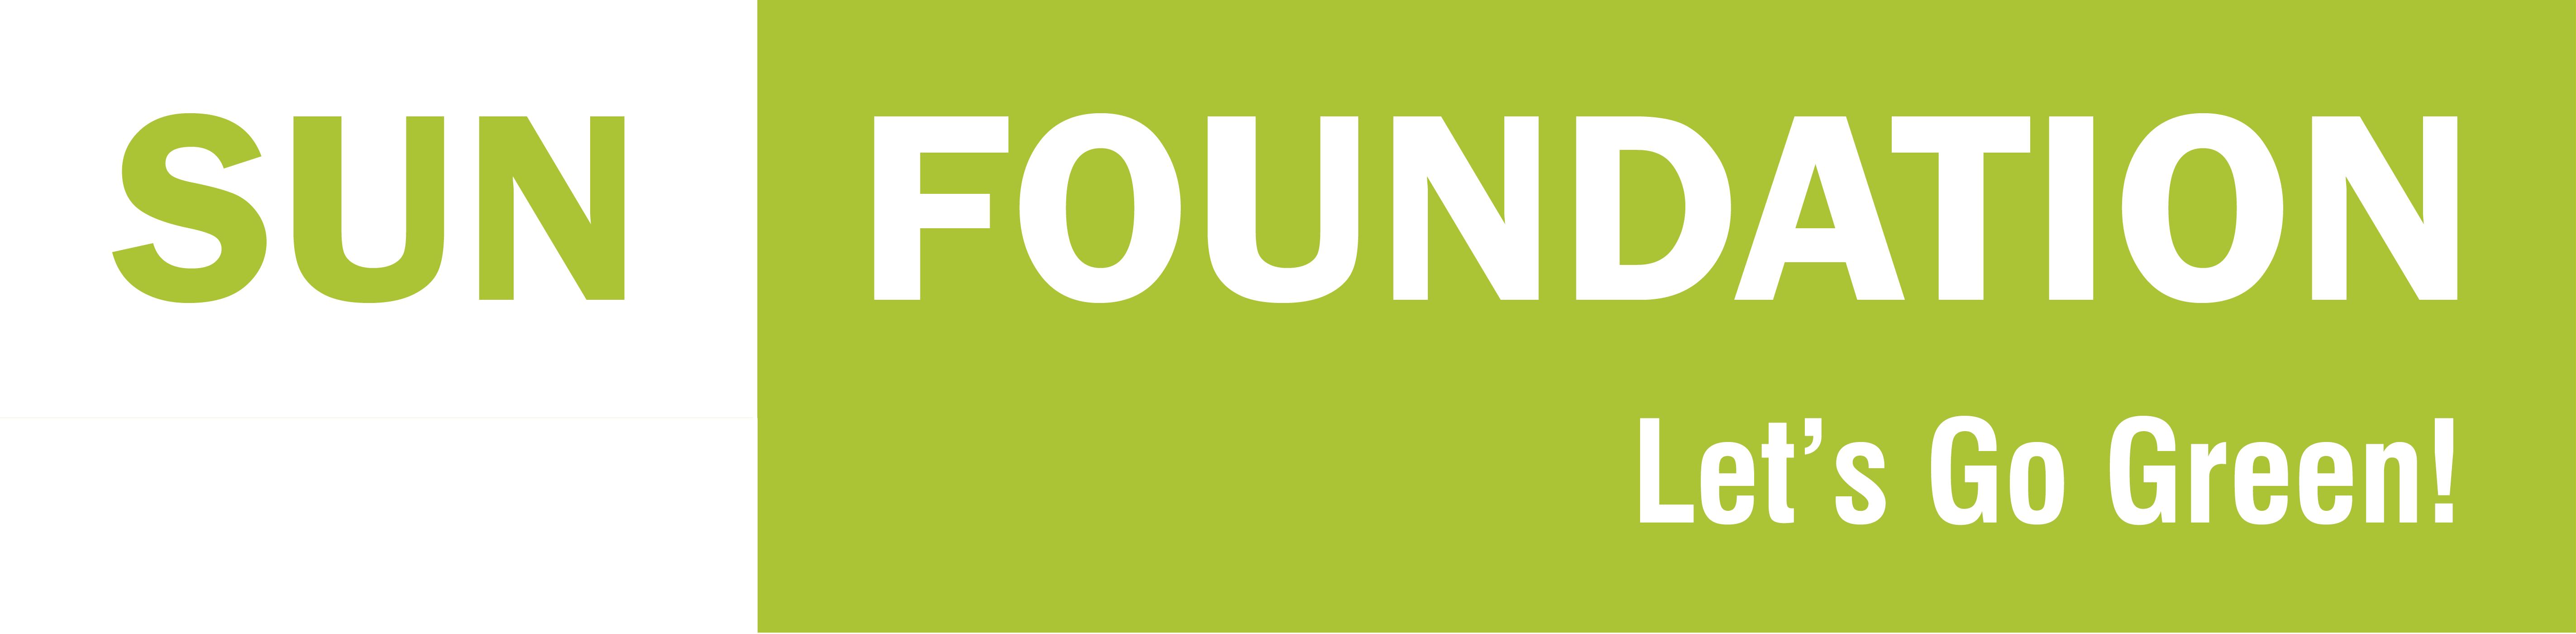 SUN Foundation